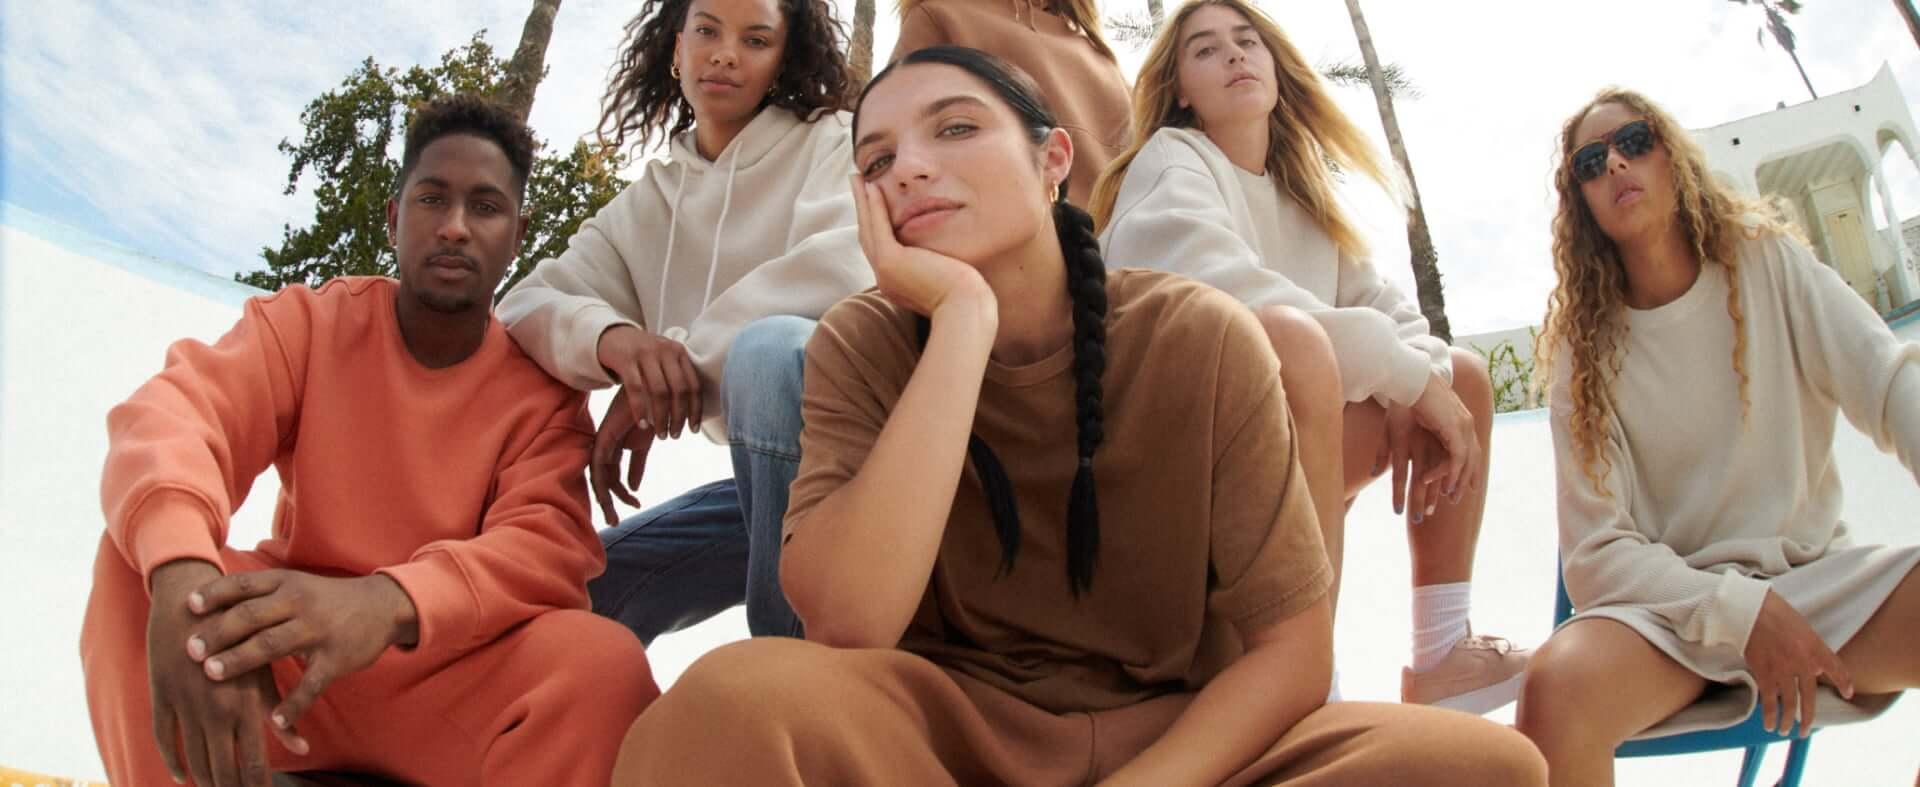 Models are wearing Garage unisex clothing.